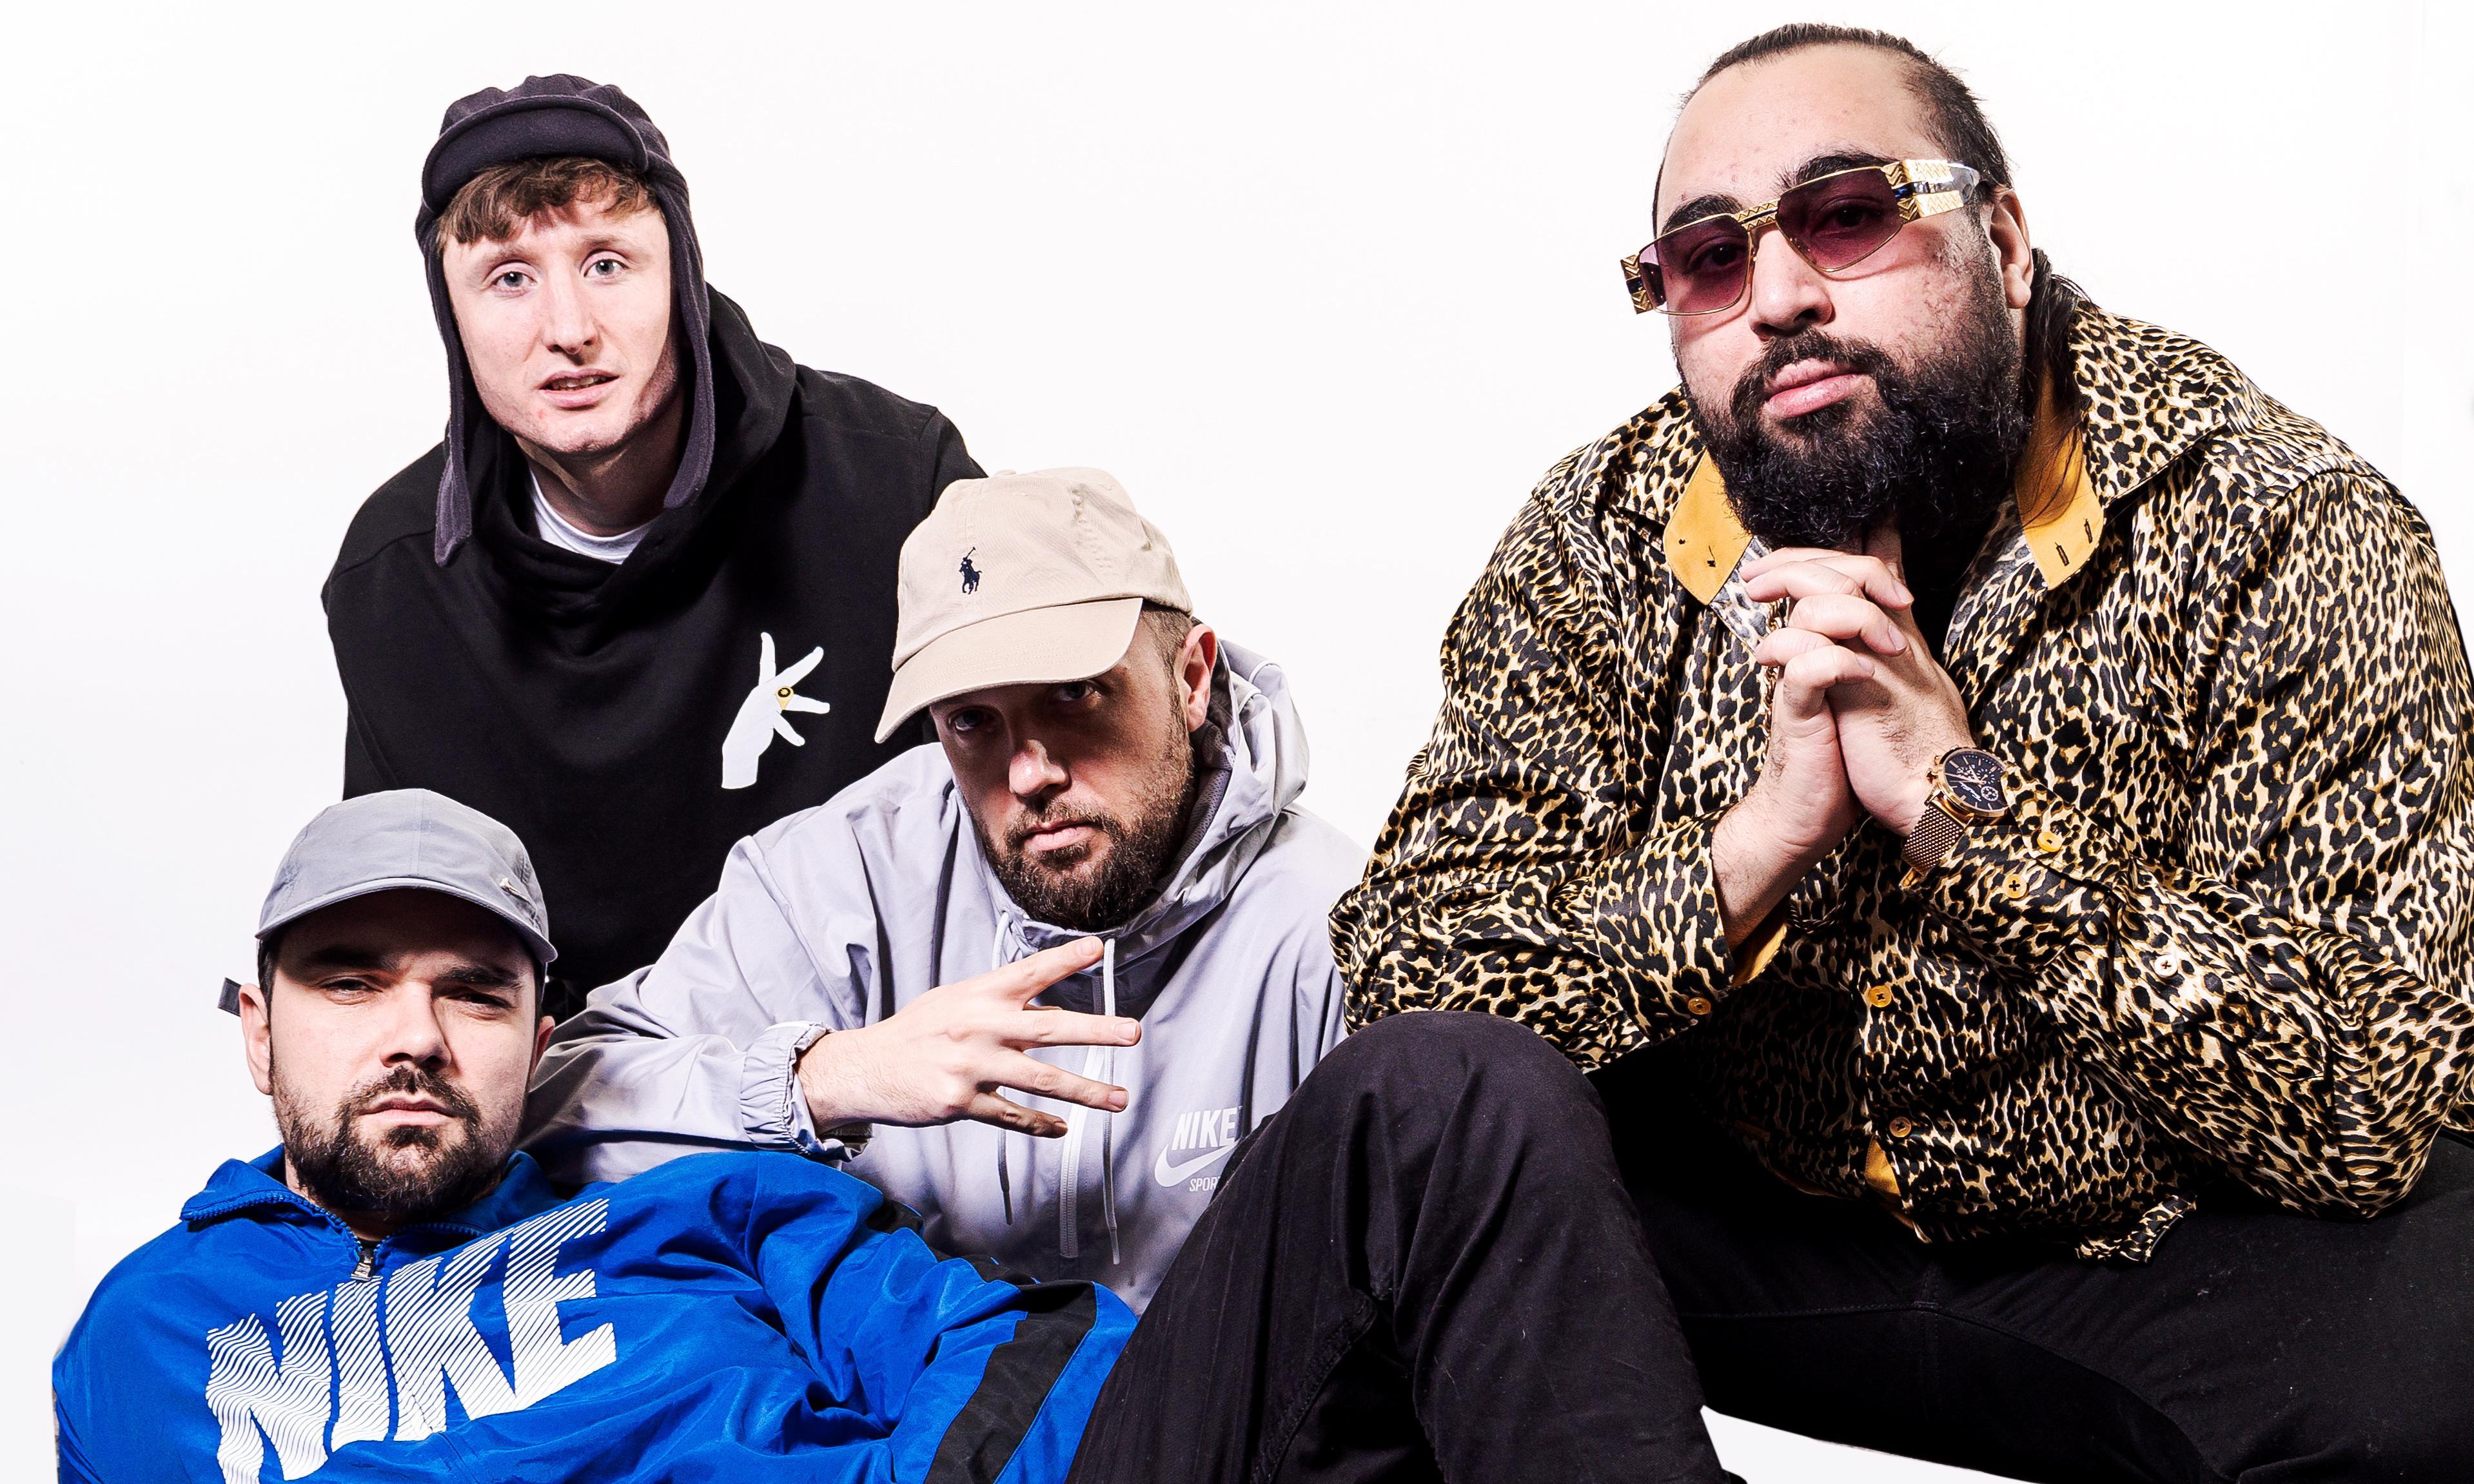 Kurupt FM: the Podkast review – glorious garage jokers join the audio goldrush